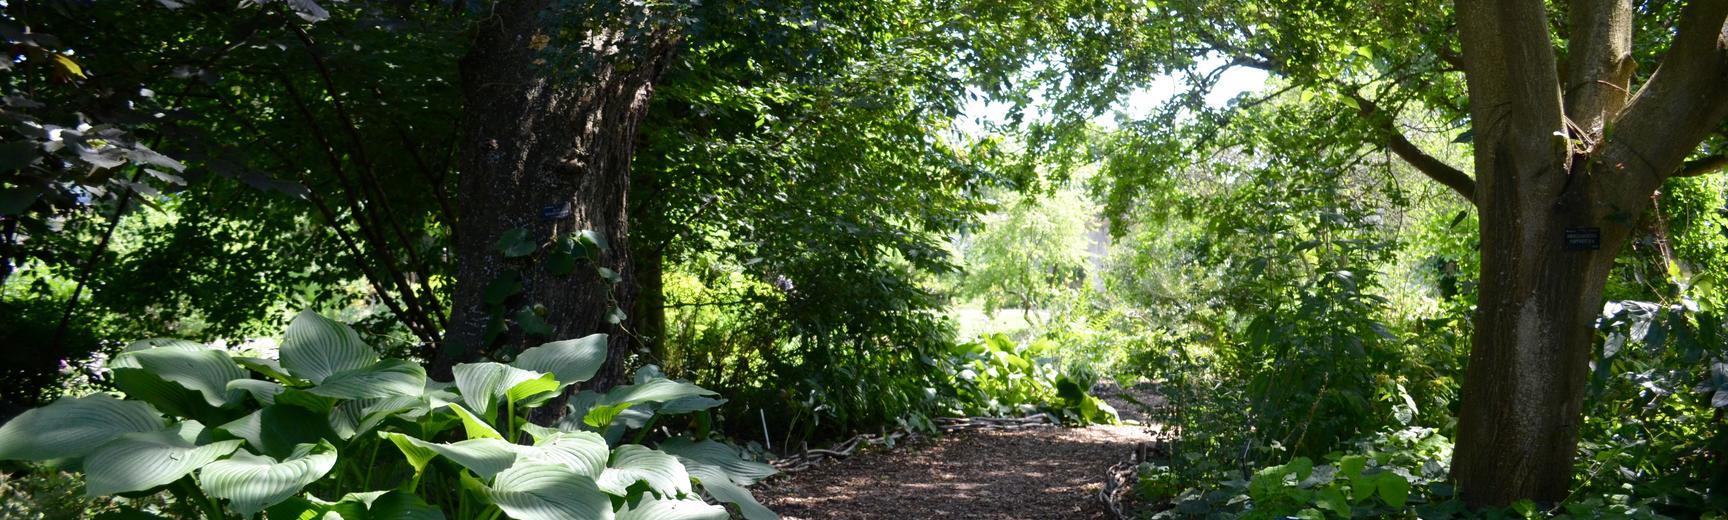 Woodland Walk at the Botanic Garden